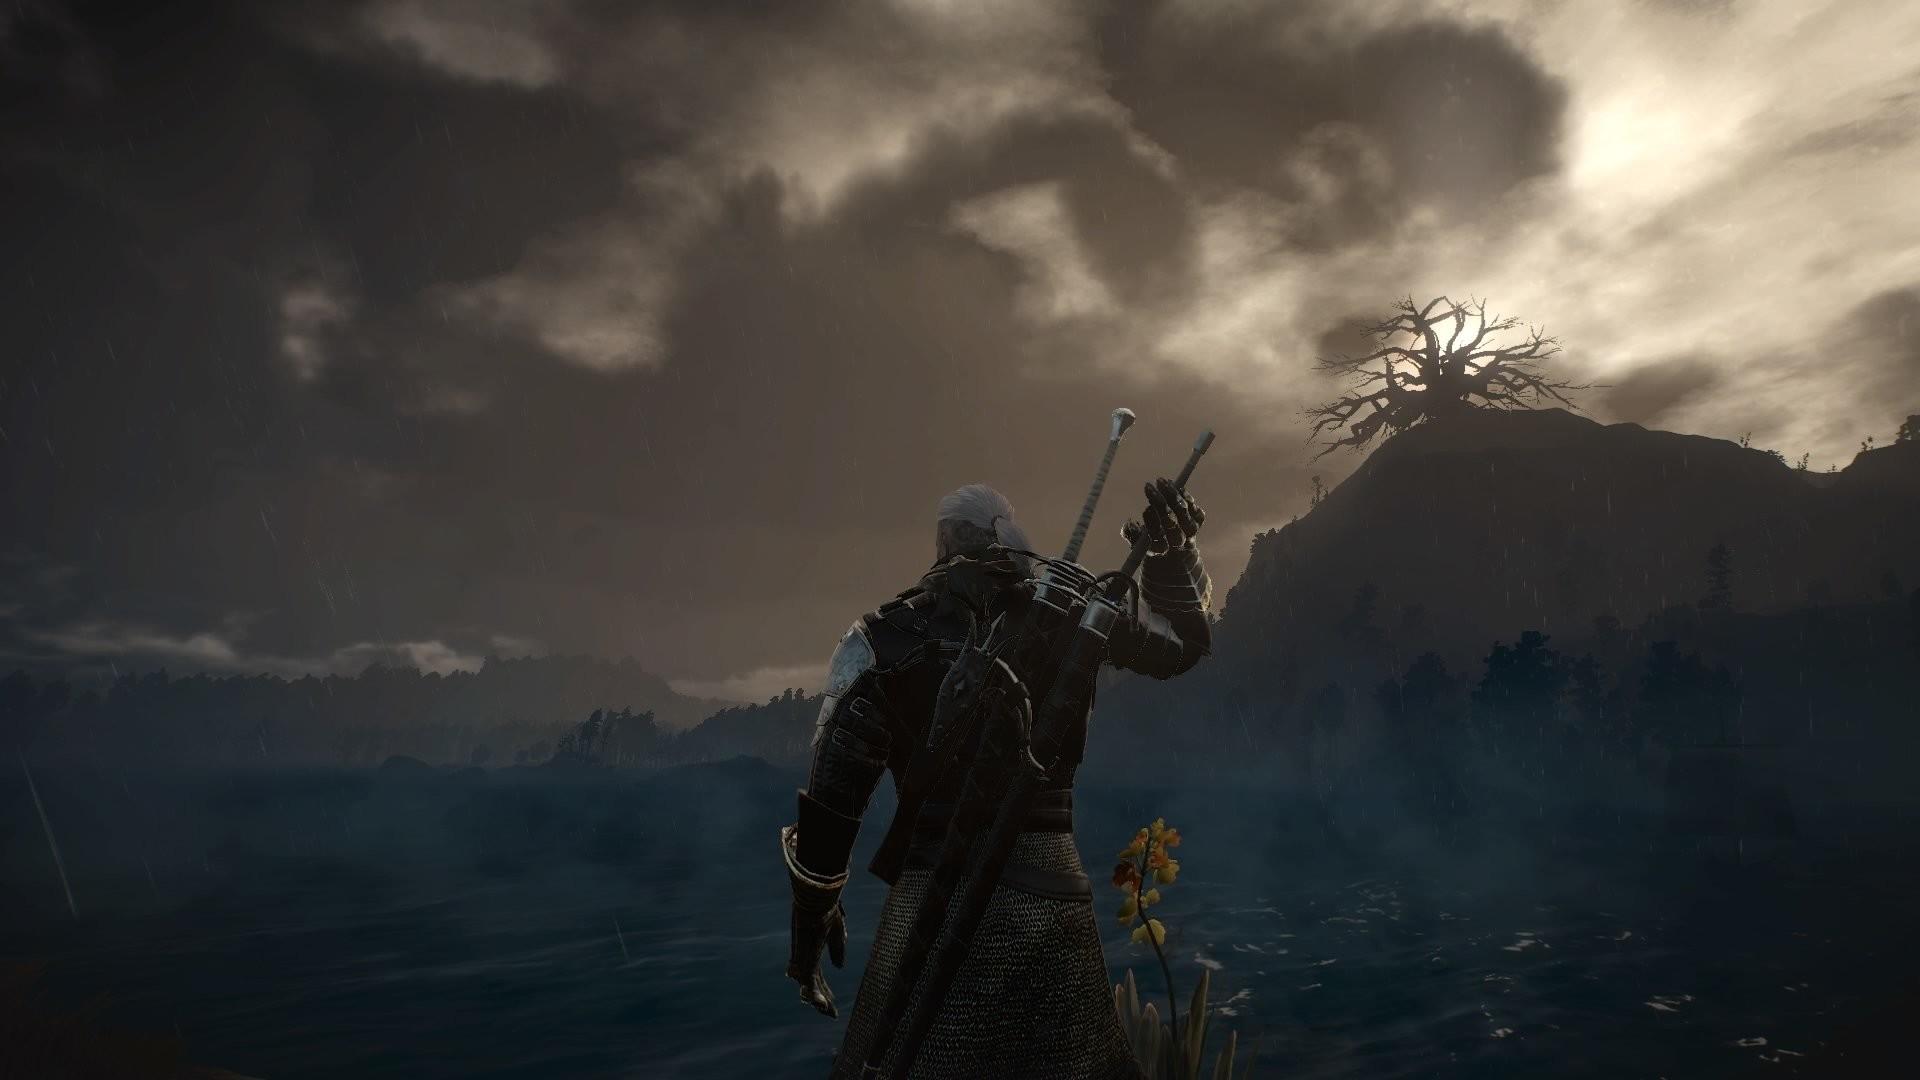 Video Game – The Witcher 3: Wild Hunt Video Game Dark Geralt of Rivia  Wallpaper